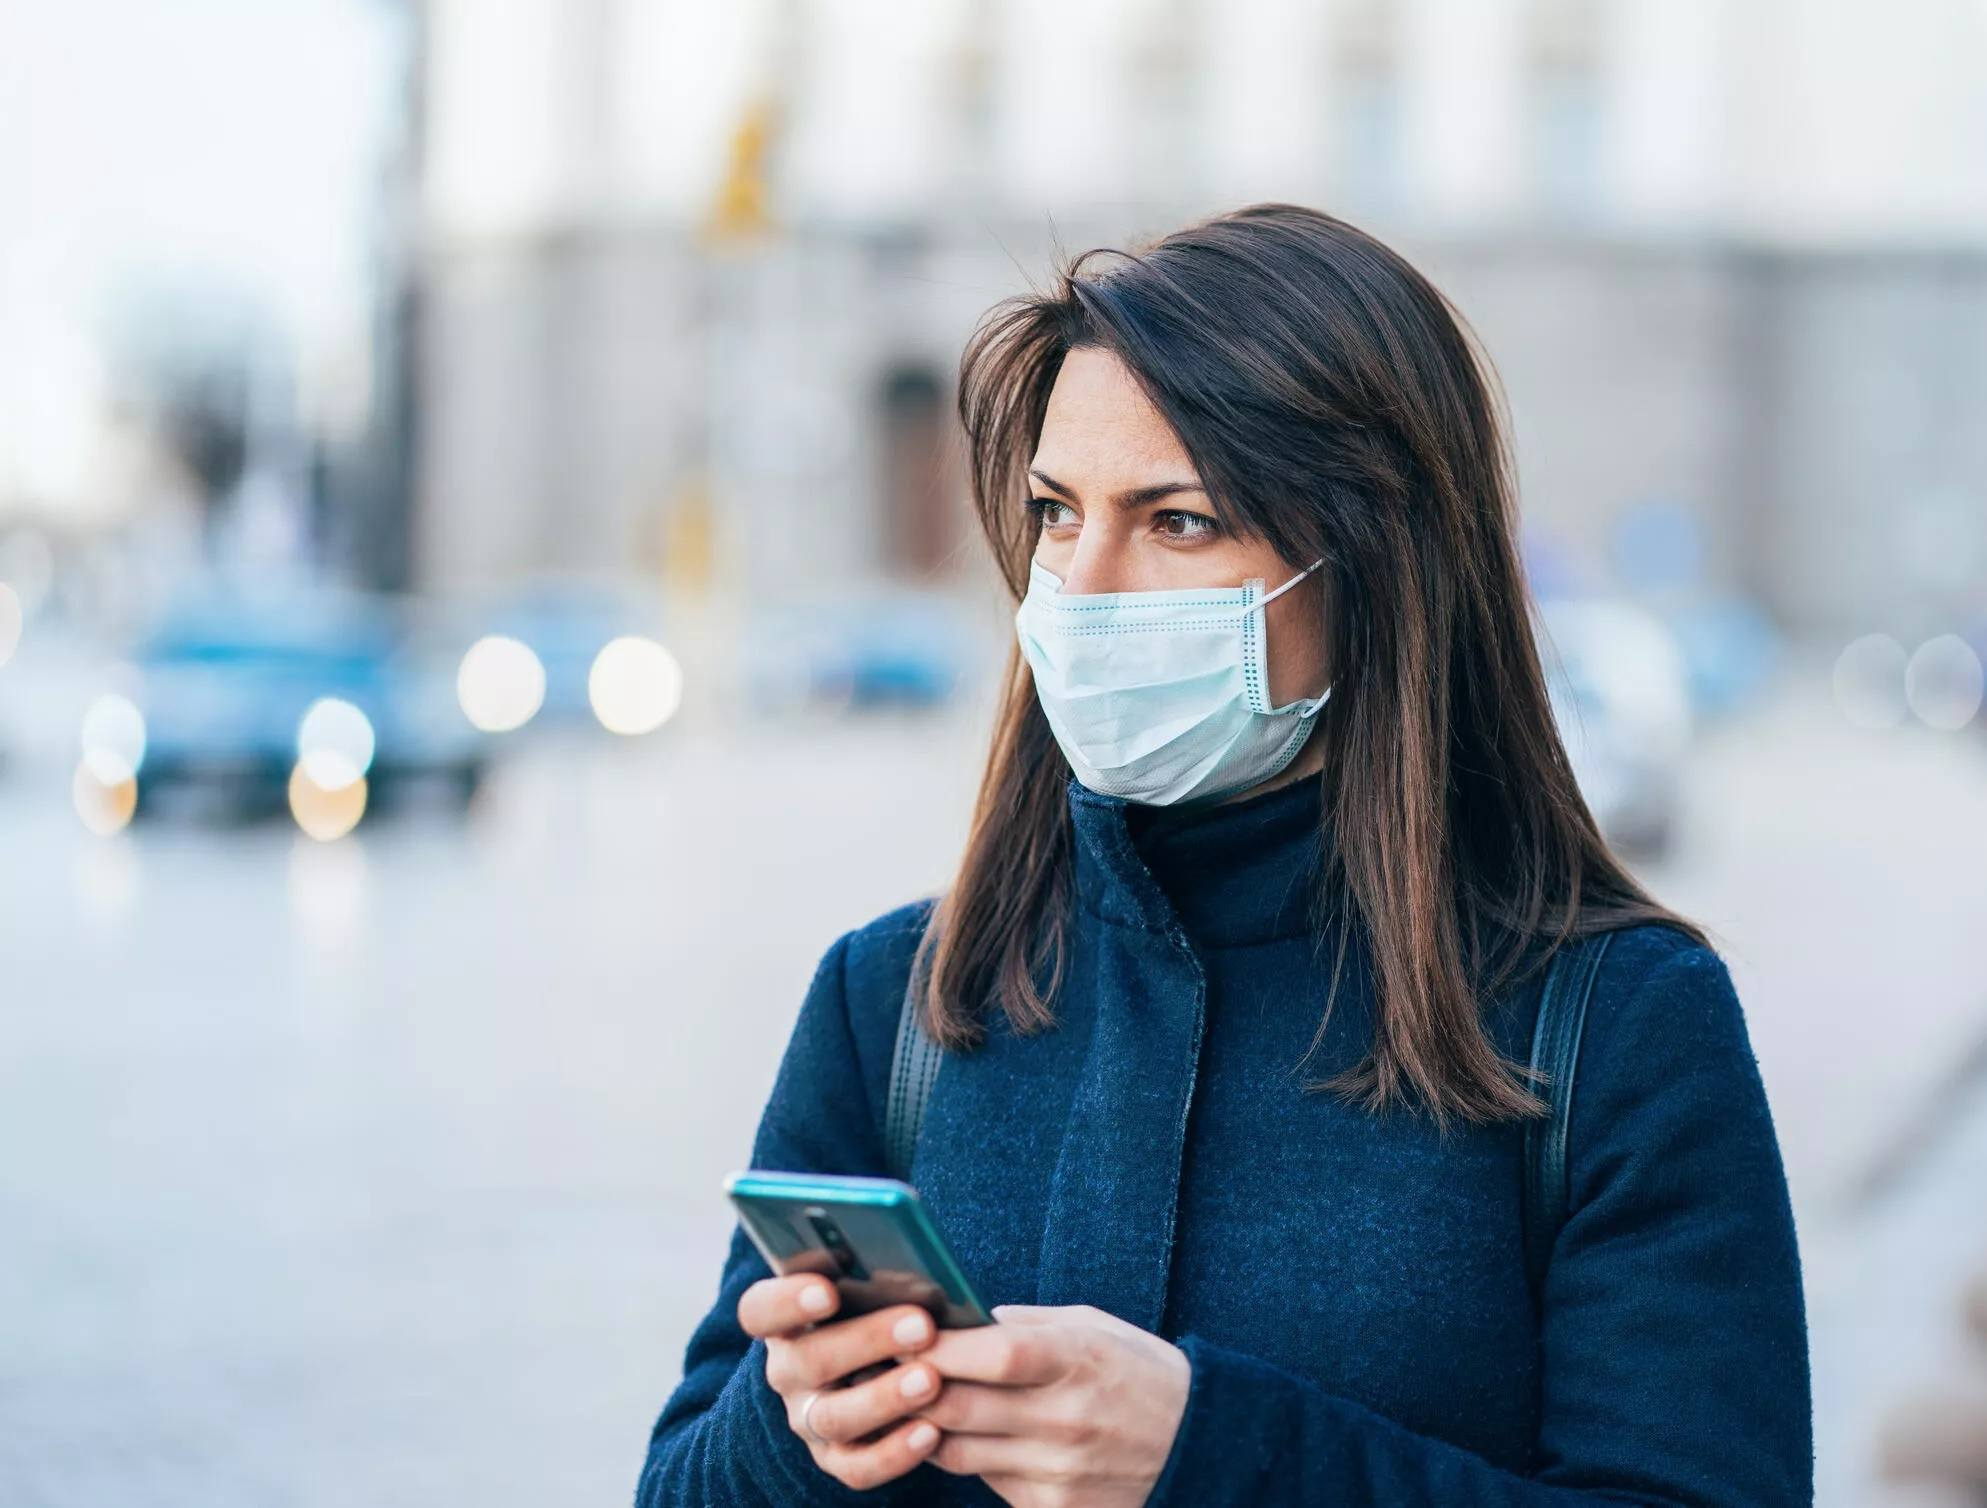 5 Handmade DIY Mask Ideas For Virus Protection 1